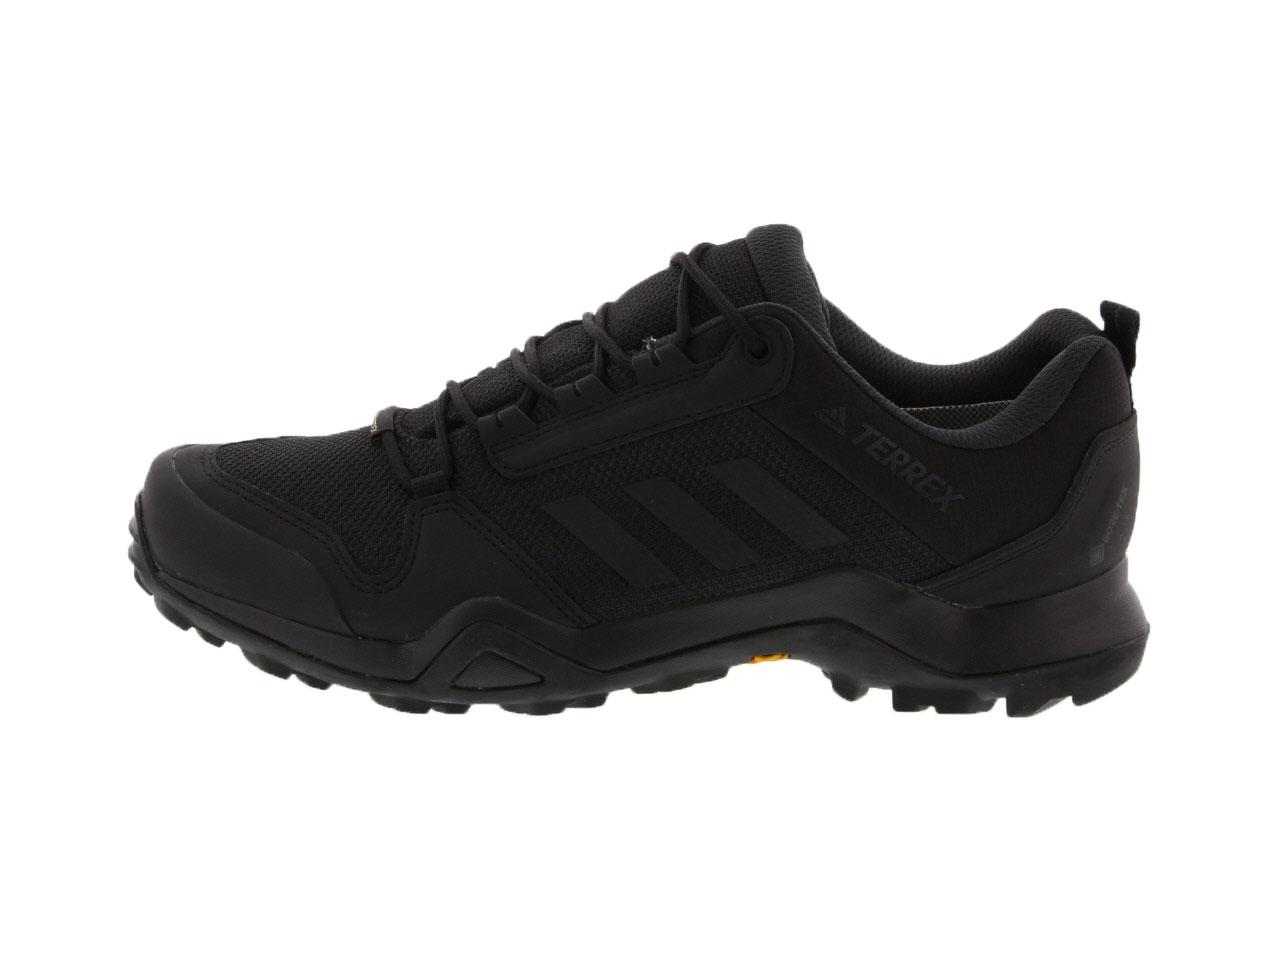 adidas TERREX AX3 GTX(BC0516)【アディダス テレックス ゴアテックス】【メンズファッション】【シューズ】【スニーカー】【靴】【フットウェア】